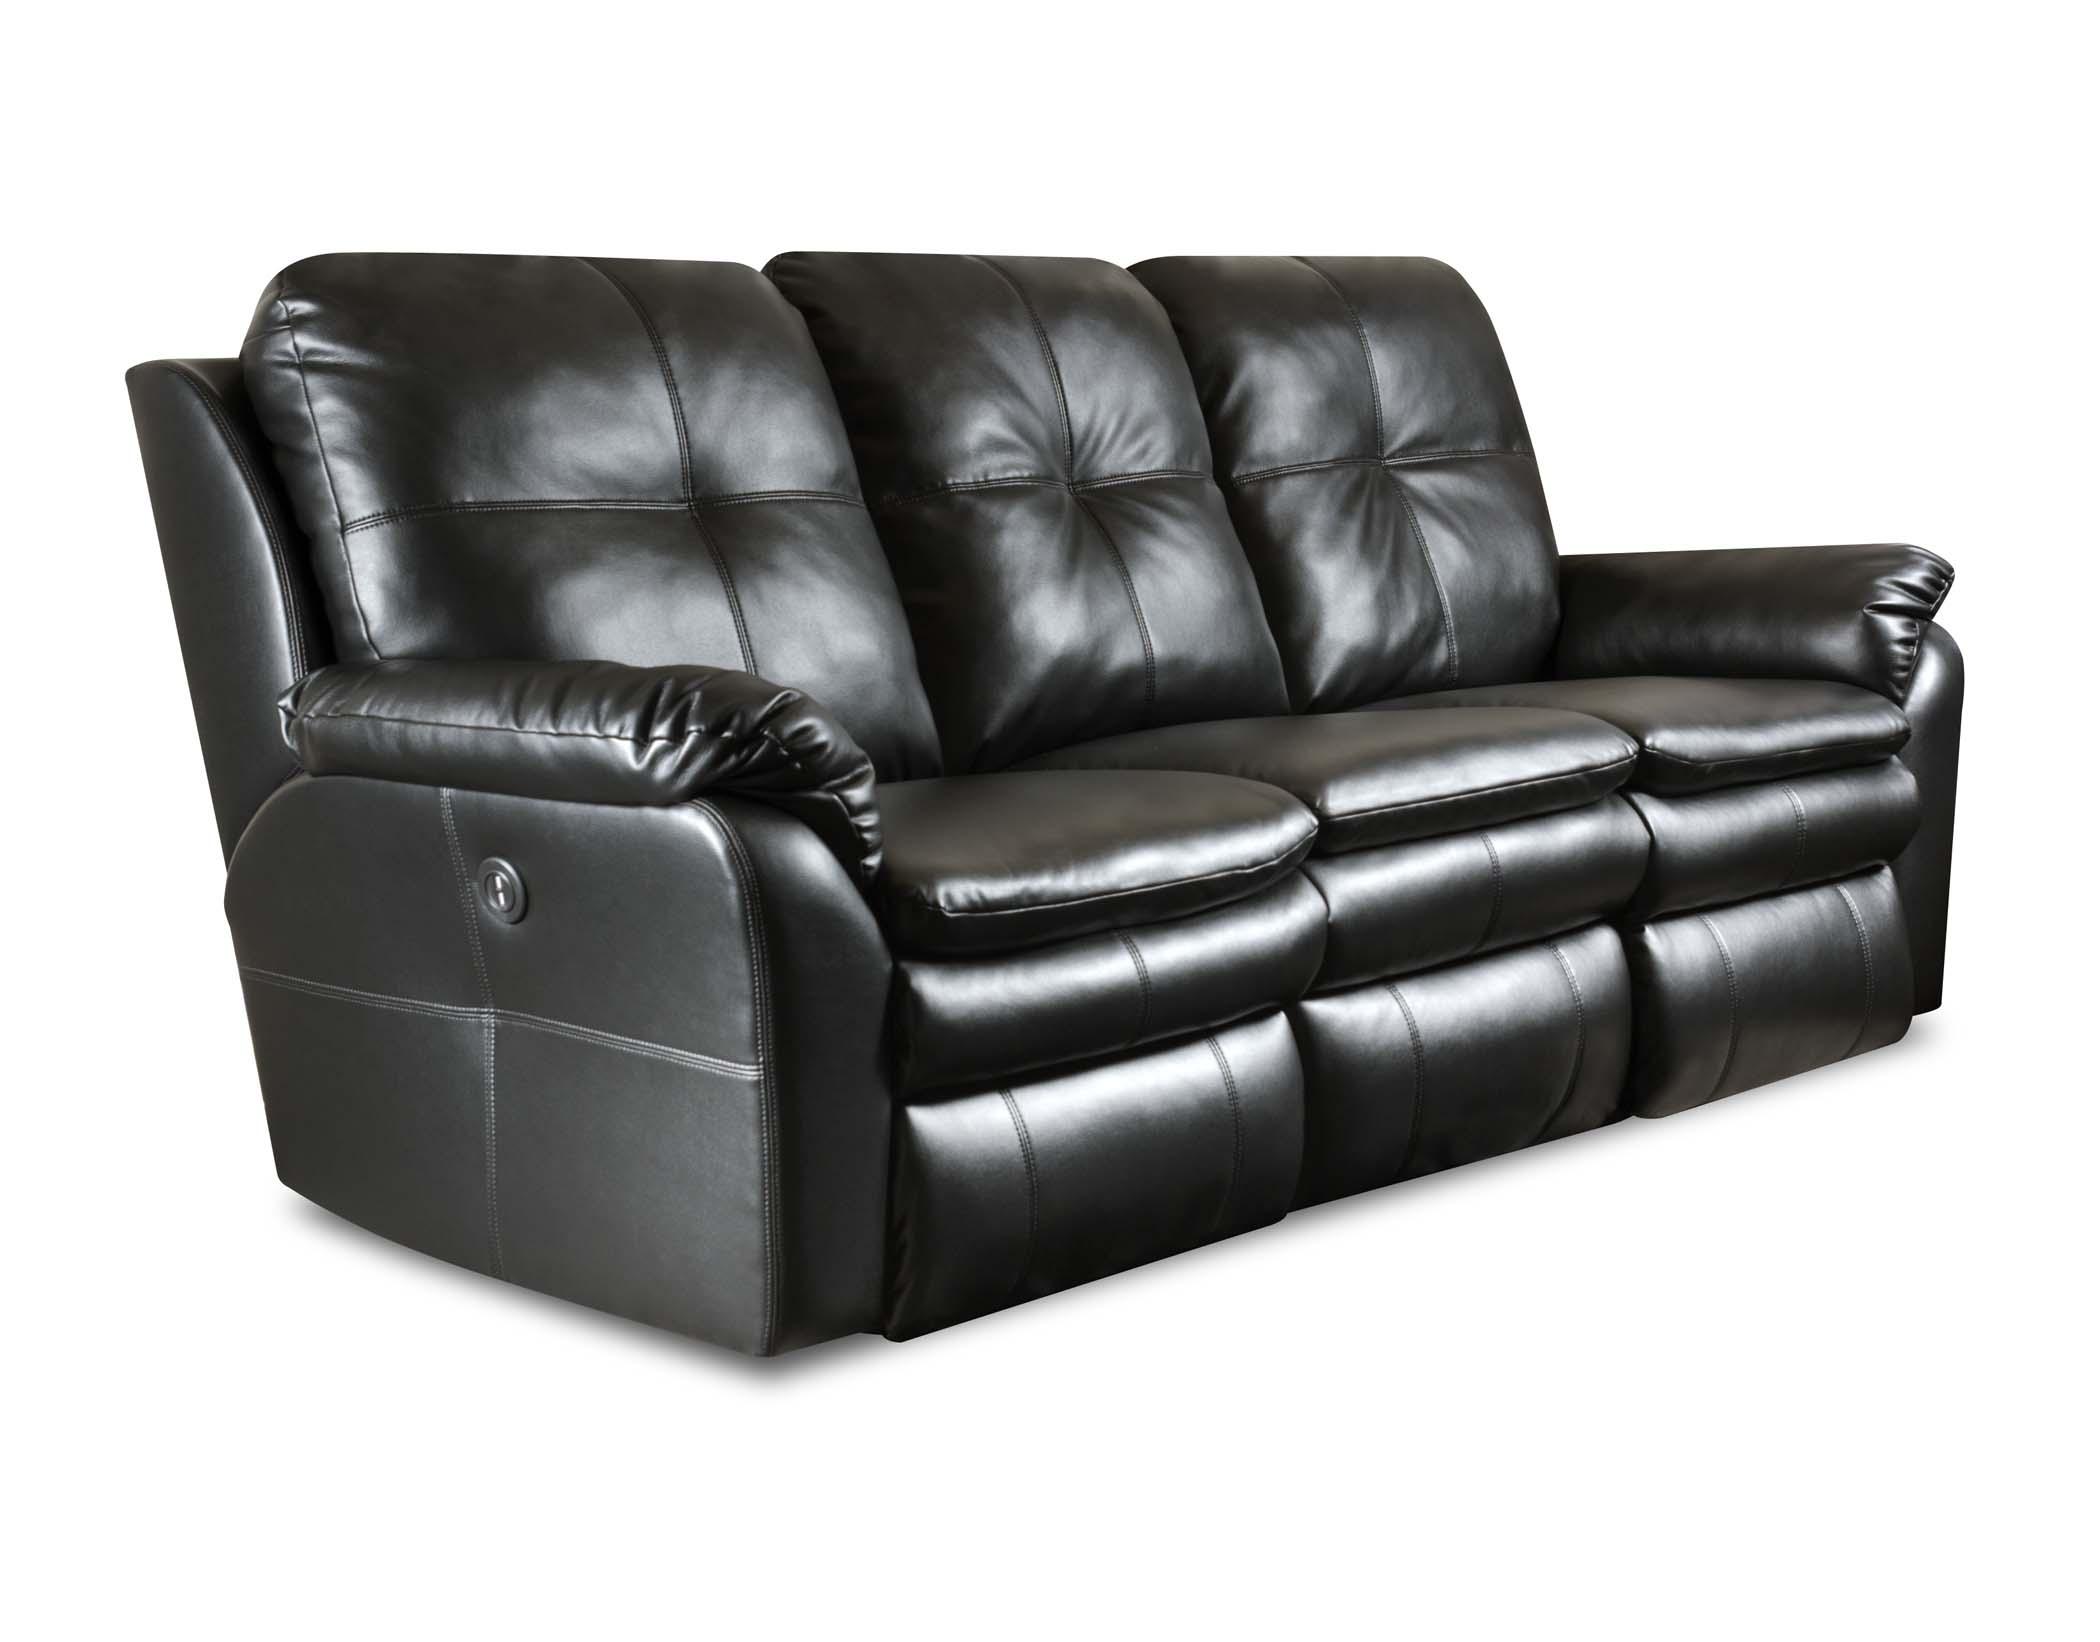 Prime Where Can I Buy Southern Motion Furniture Broadway Furniture Download Free Architecture Designs Xoliawazosbritishbridgeorg